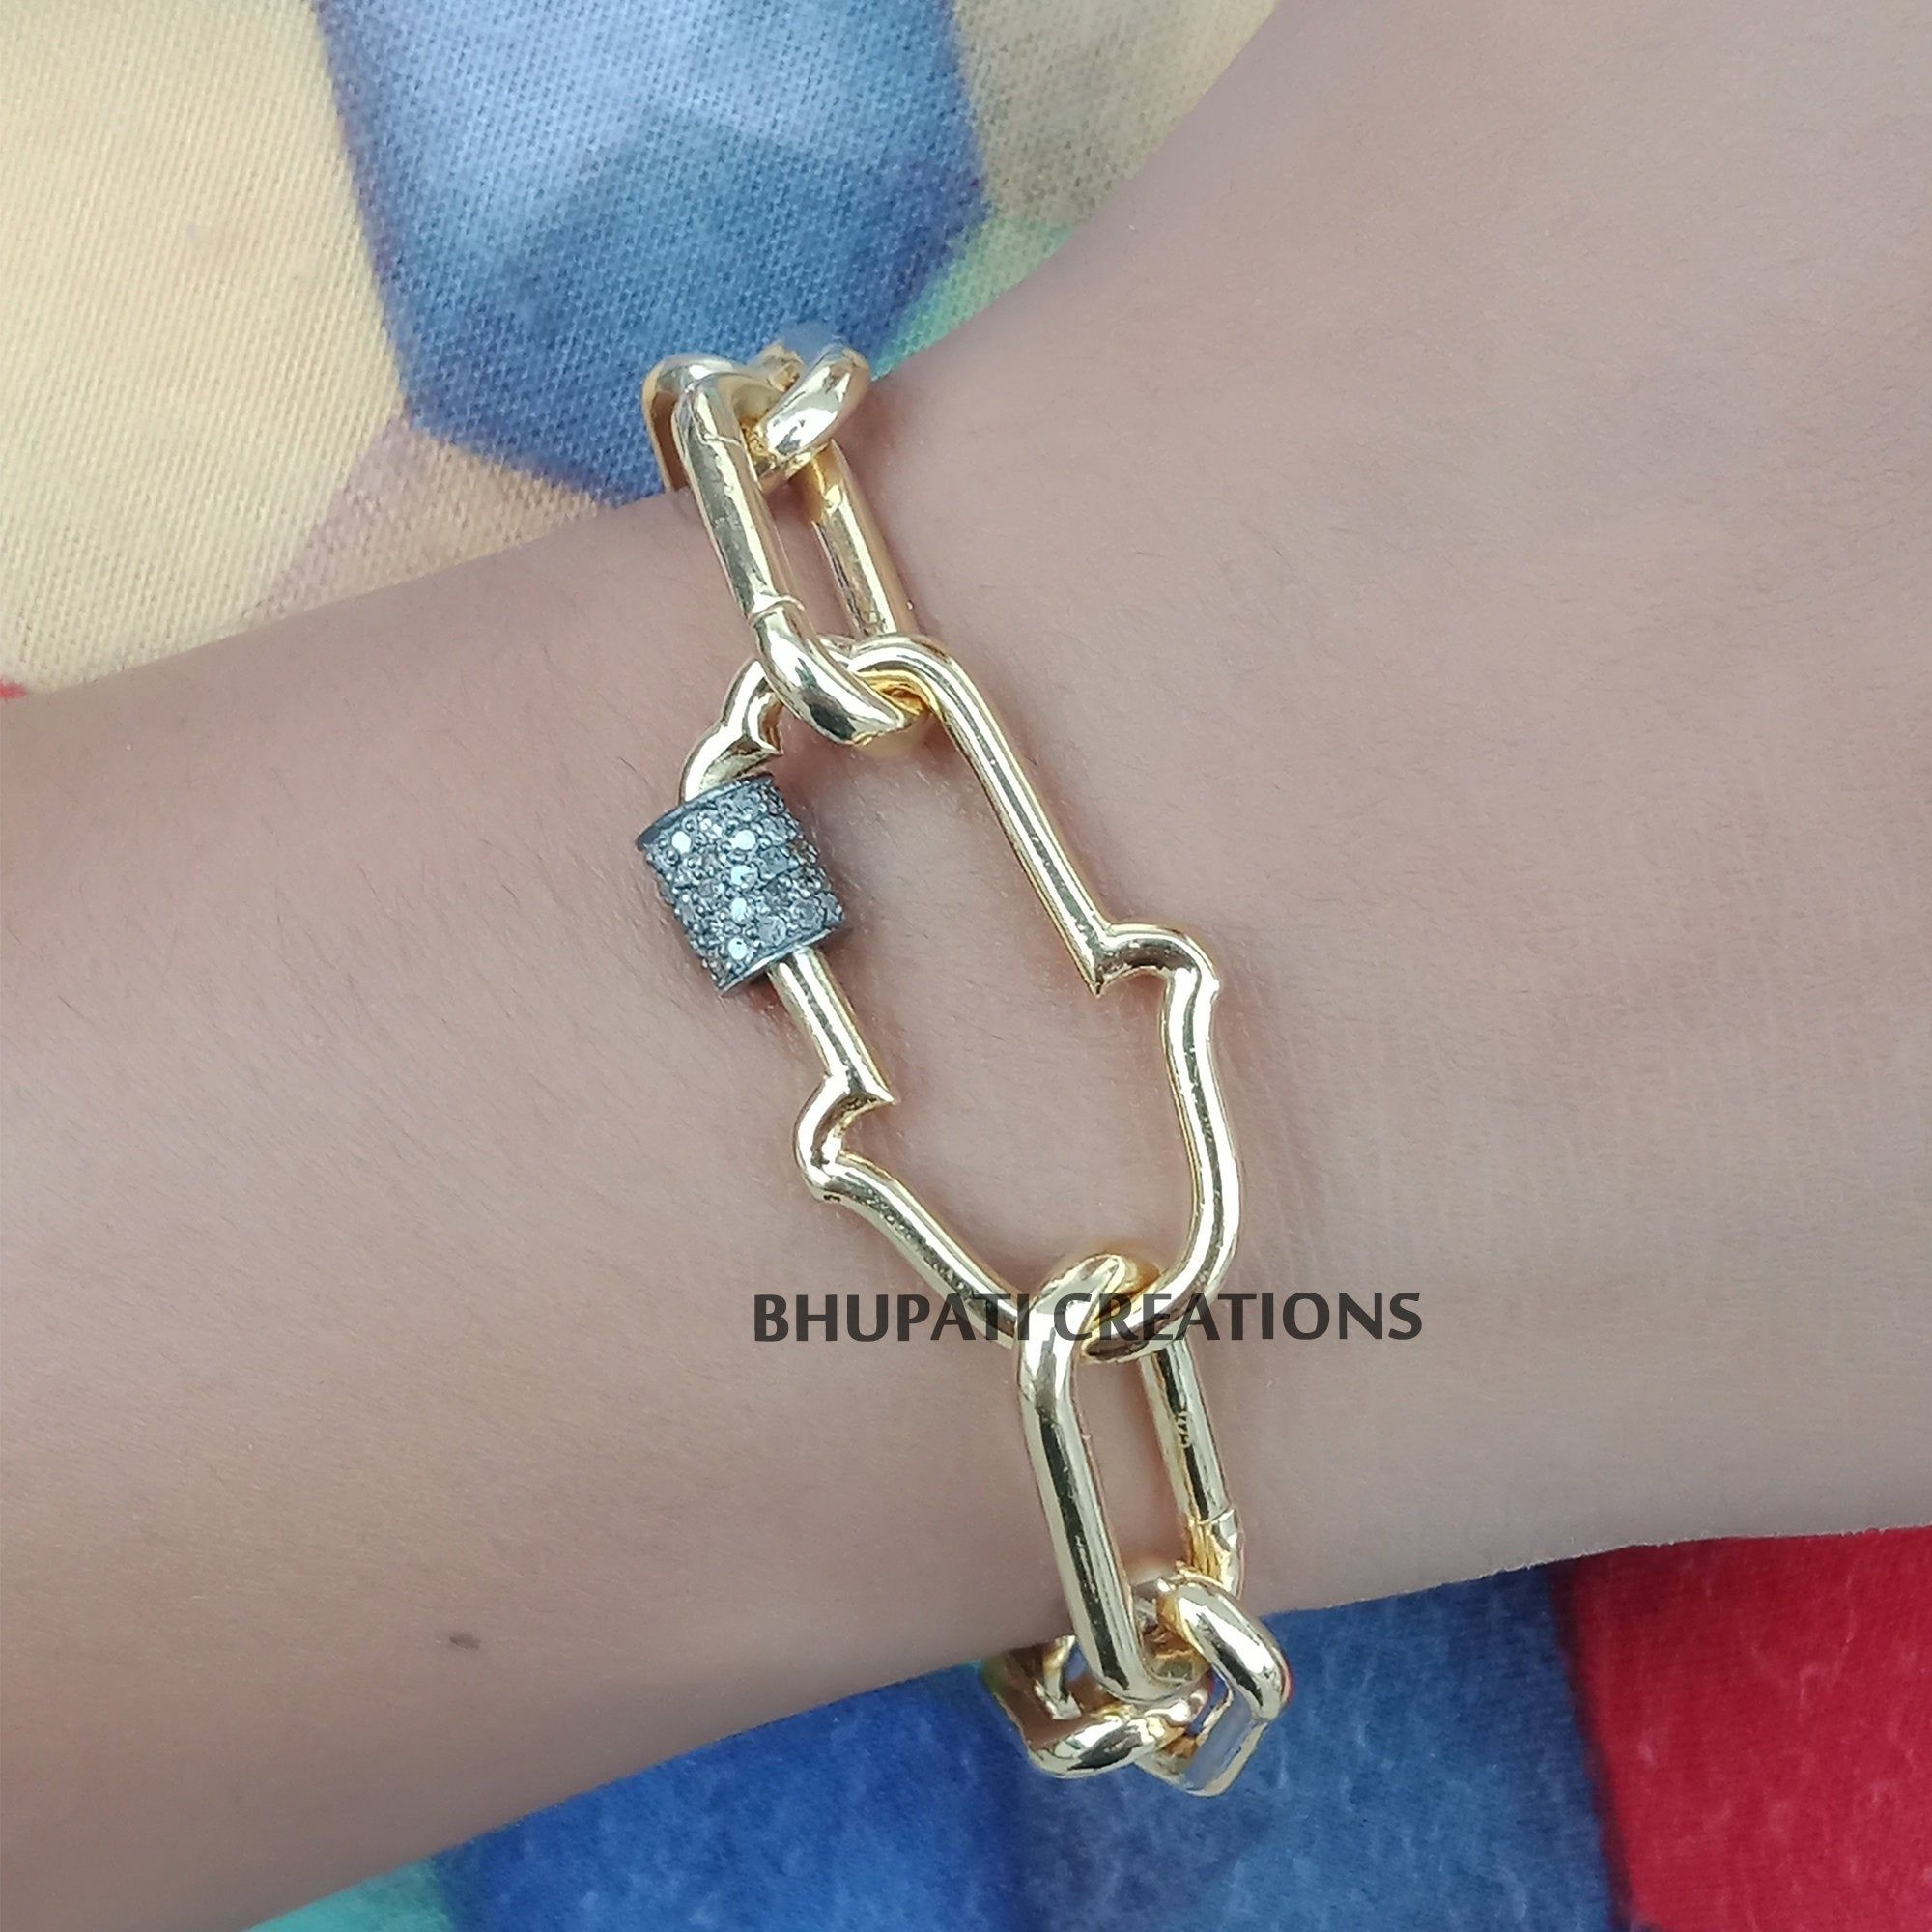 14k Gold Pave Diamond Dog Bone Carabiner Lock Handmade Silver Finding Jewelry